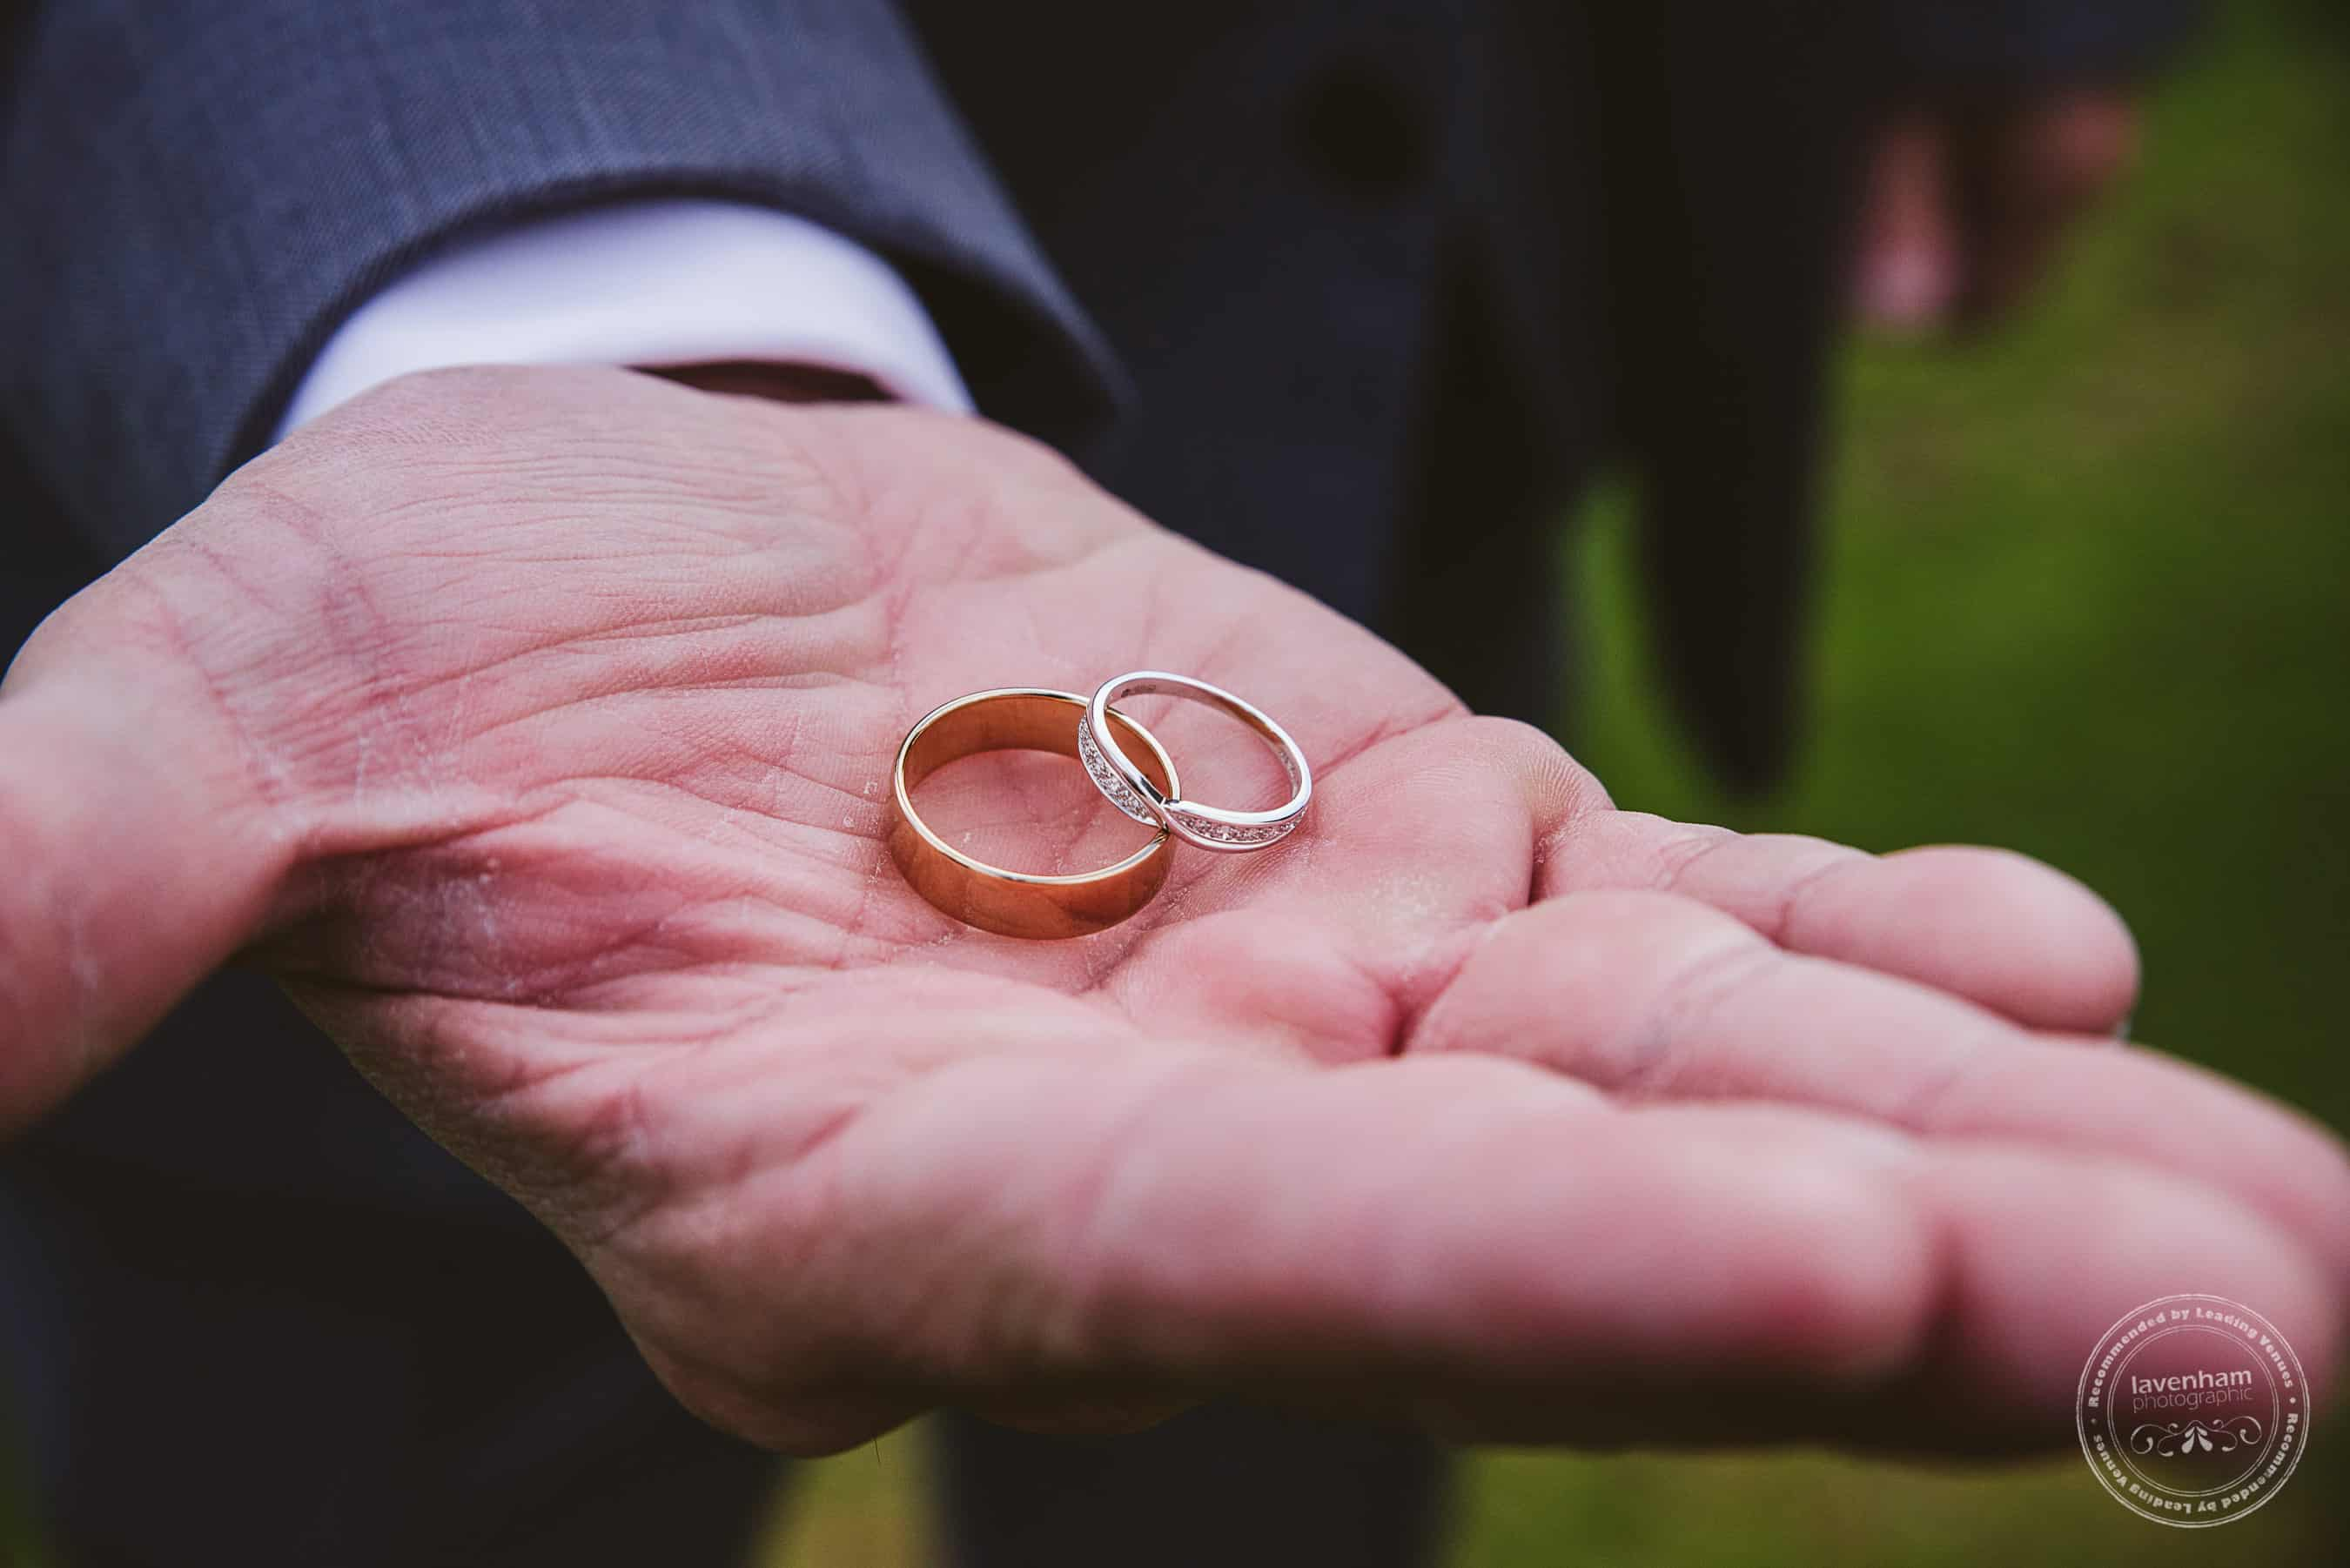 281018 Gosfield Hall Wedding Photography Lavenham Photographic 029